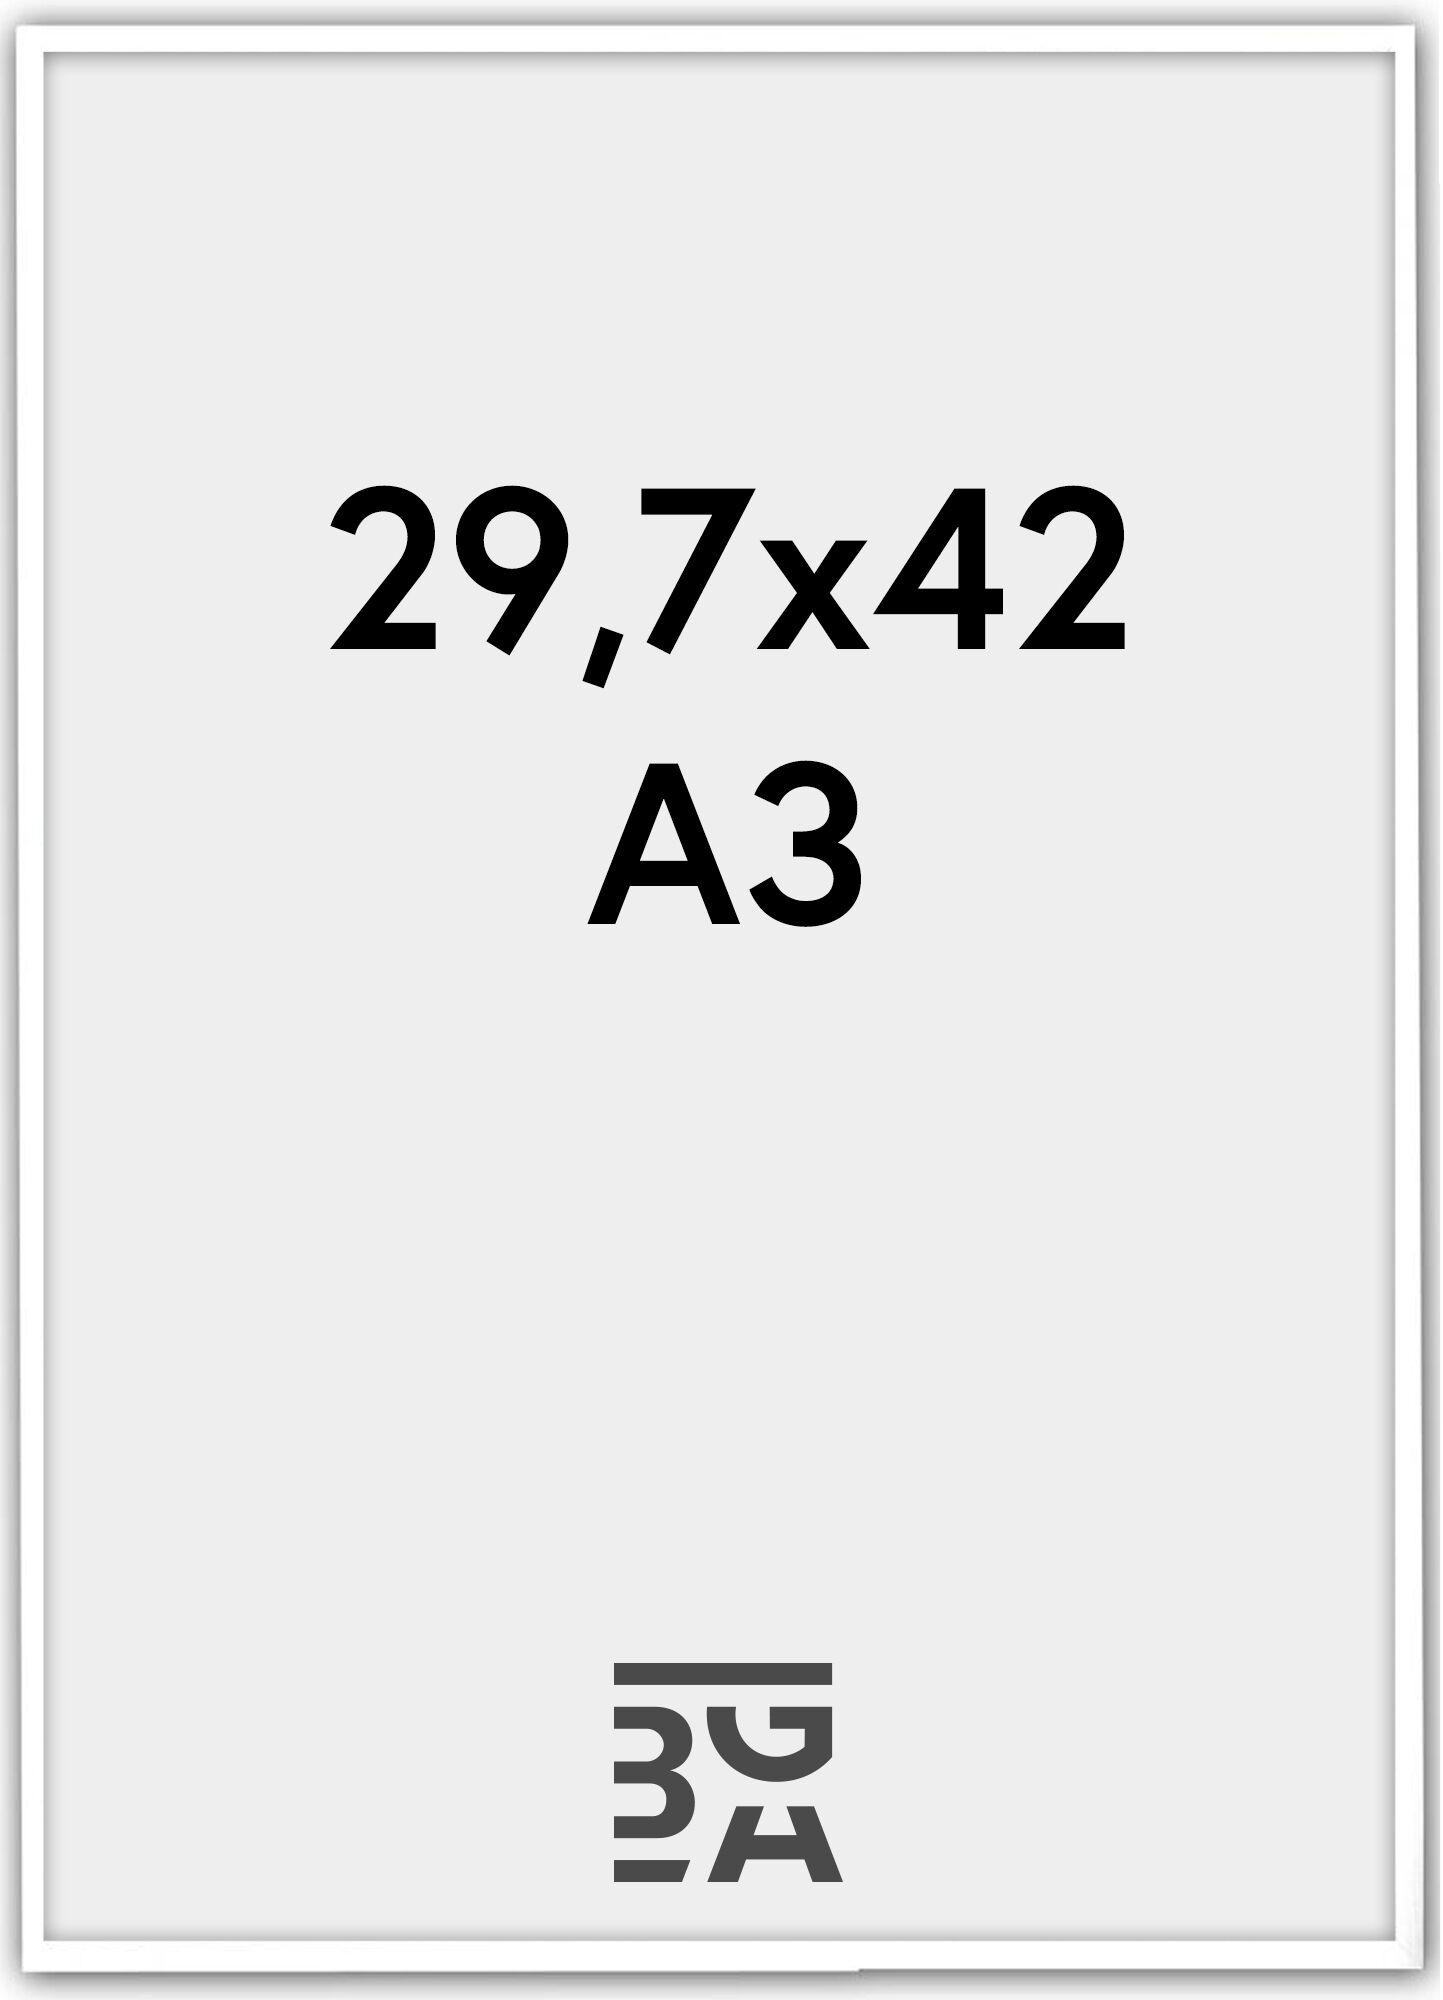 Estancia Galant Pleksilasi Valkoinen 29,7x42 cm (A3)